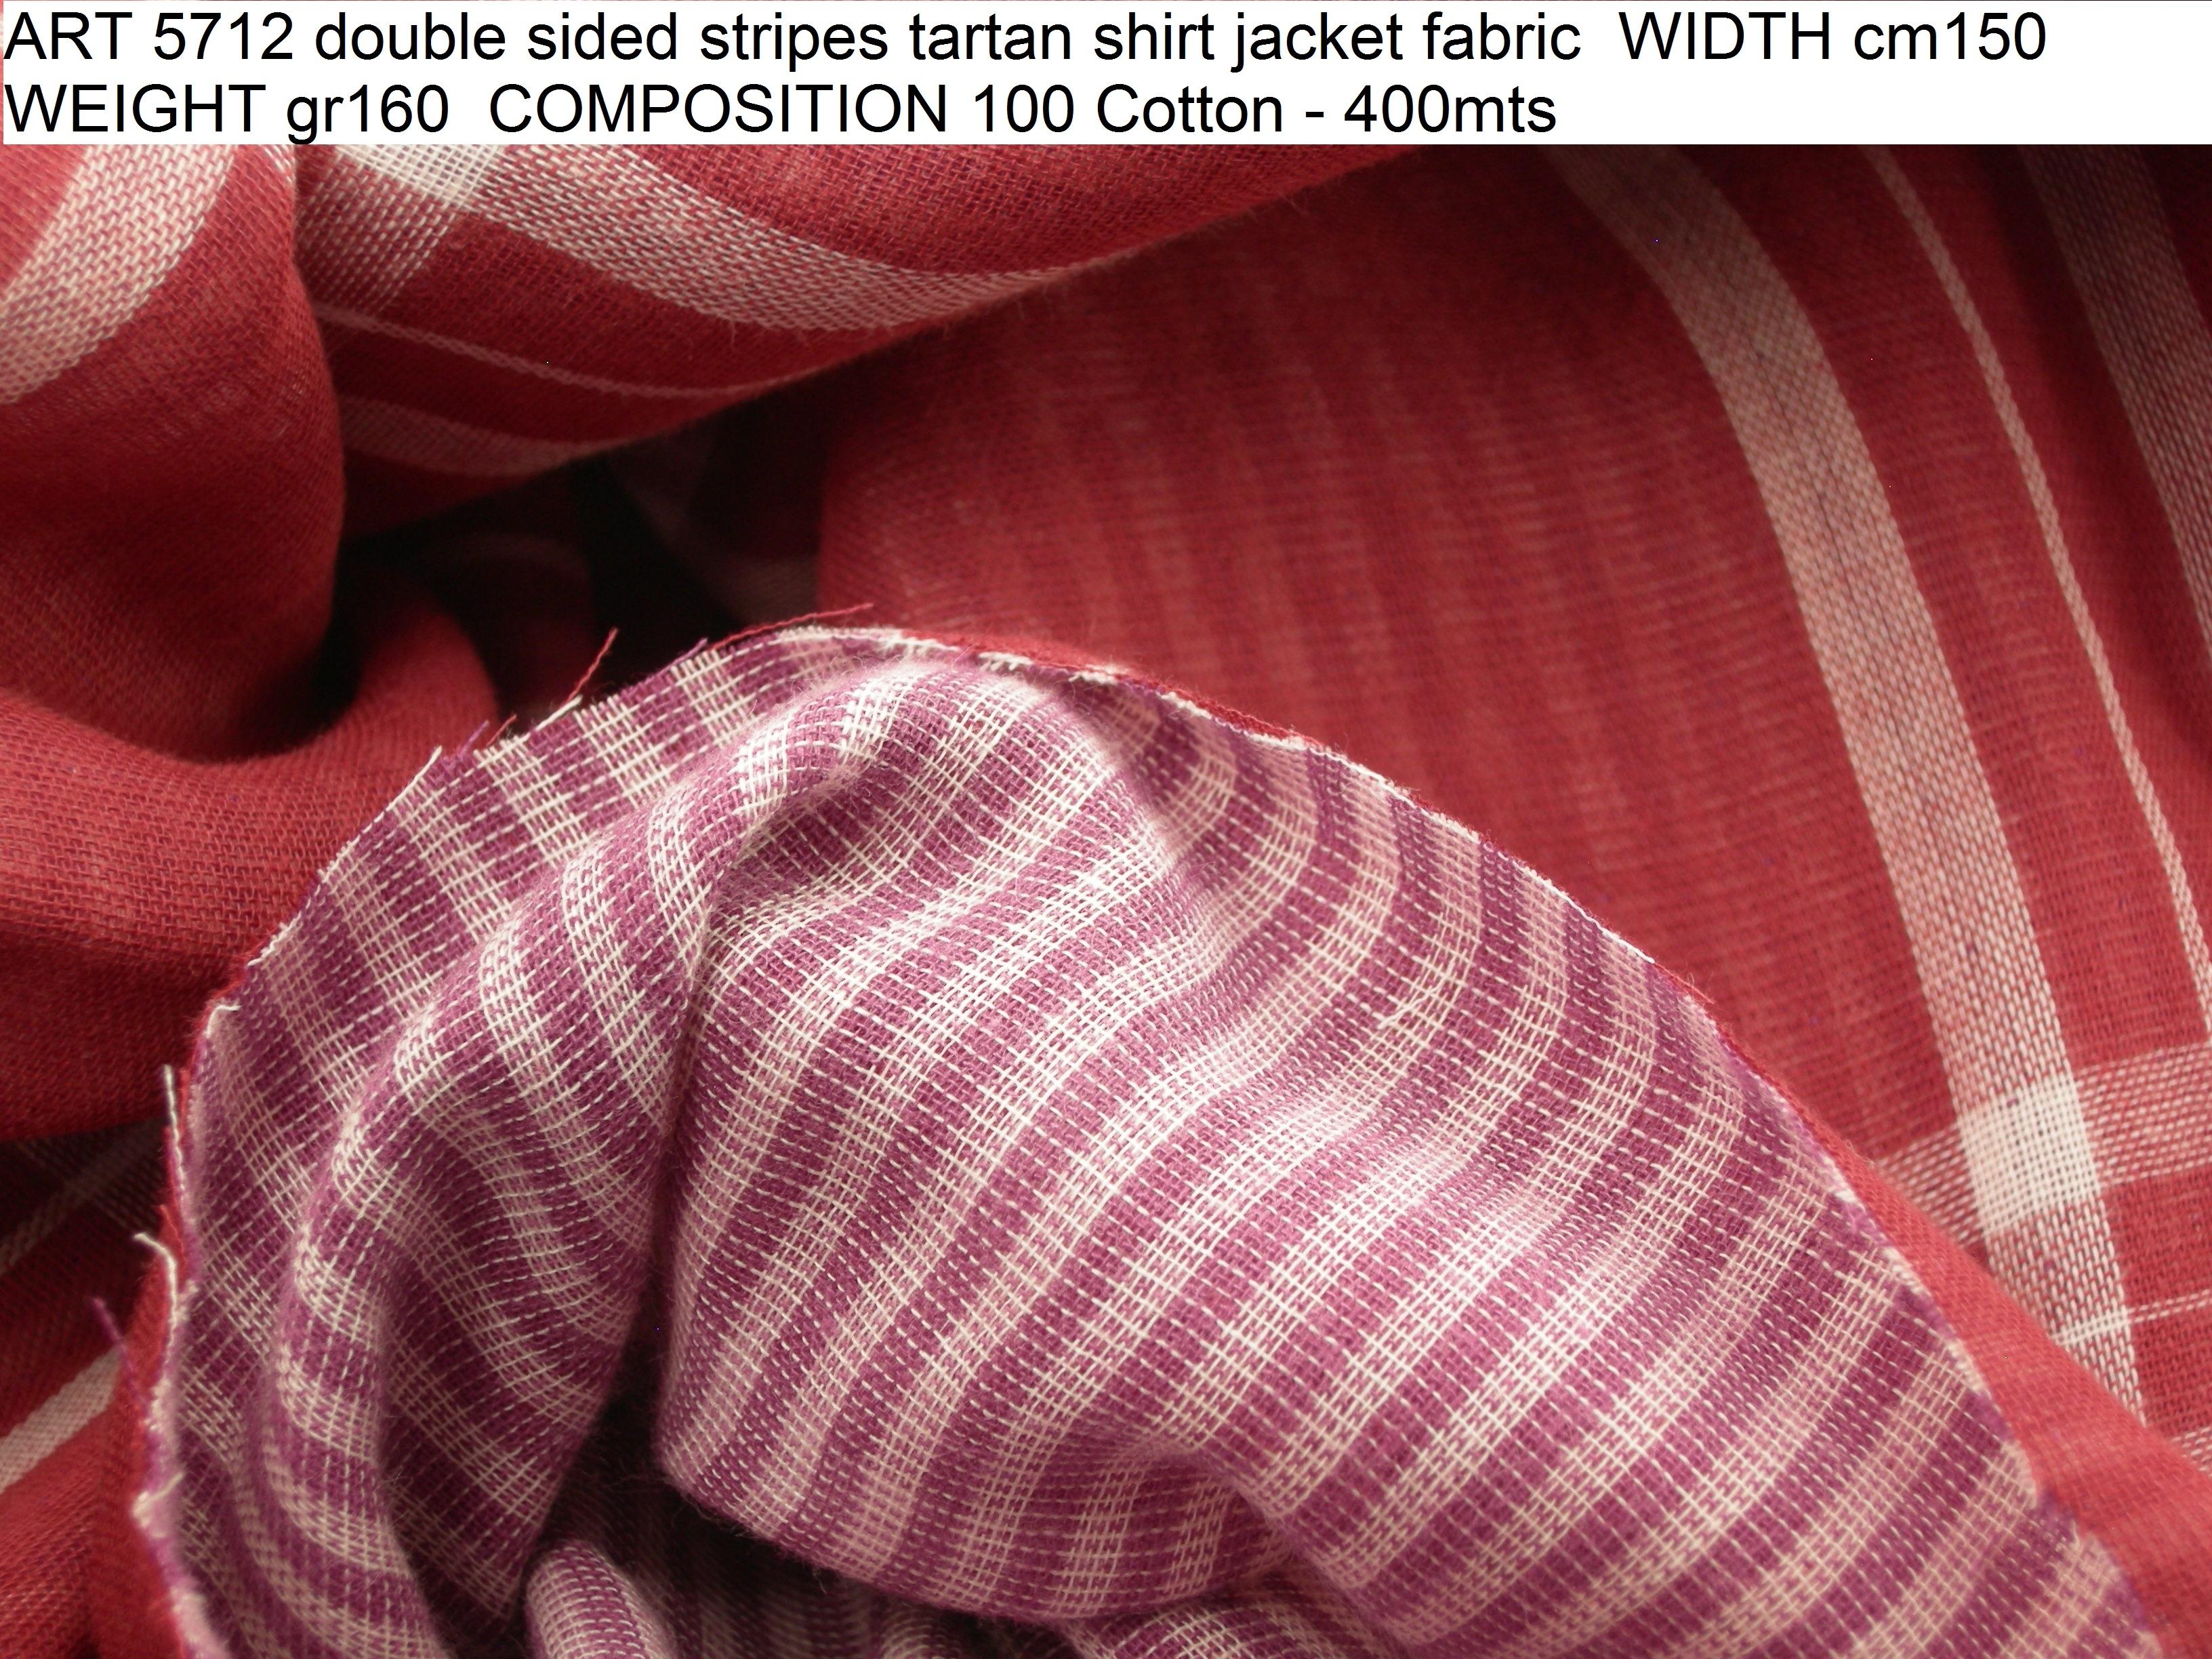 ART 5712 double sided stripes tartan shirt jacket fabric WIDTH cm150 WEIGHT gr160 COMPOSITION 100 Cotton - 400mts